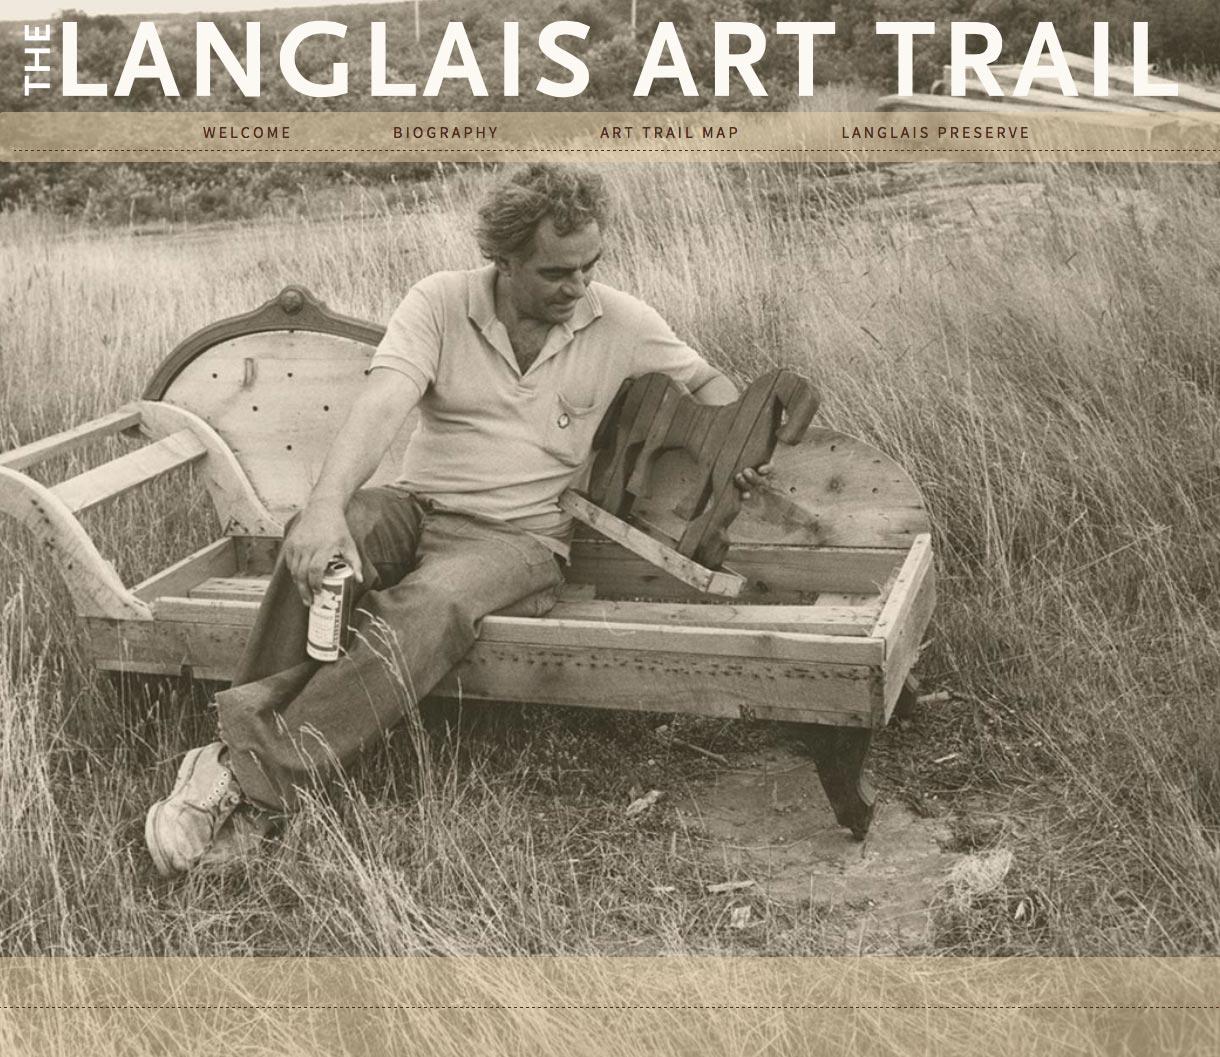 Langlais Art Trail home